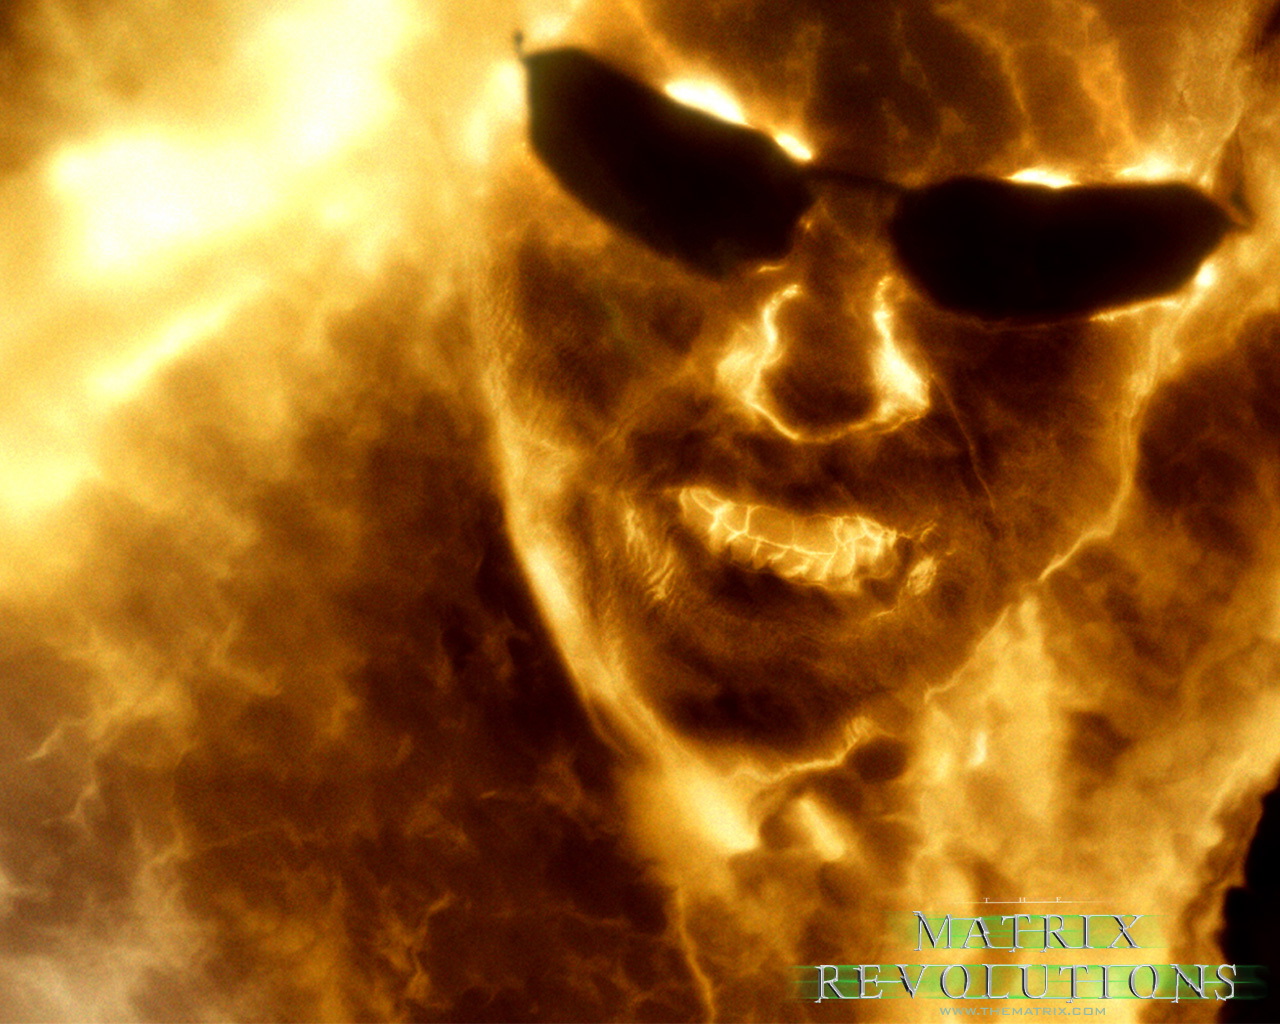 http://3.bp.blogspot.com/-qX1CL8BgLcs/UAwE55ssSxI/AAAAAAAAAp4/ZlsfUo1y48g/s1600/The_Matrix_Revolutions_Wallpaper_28_1280.jpg